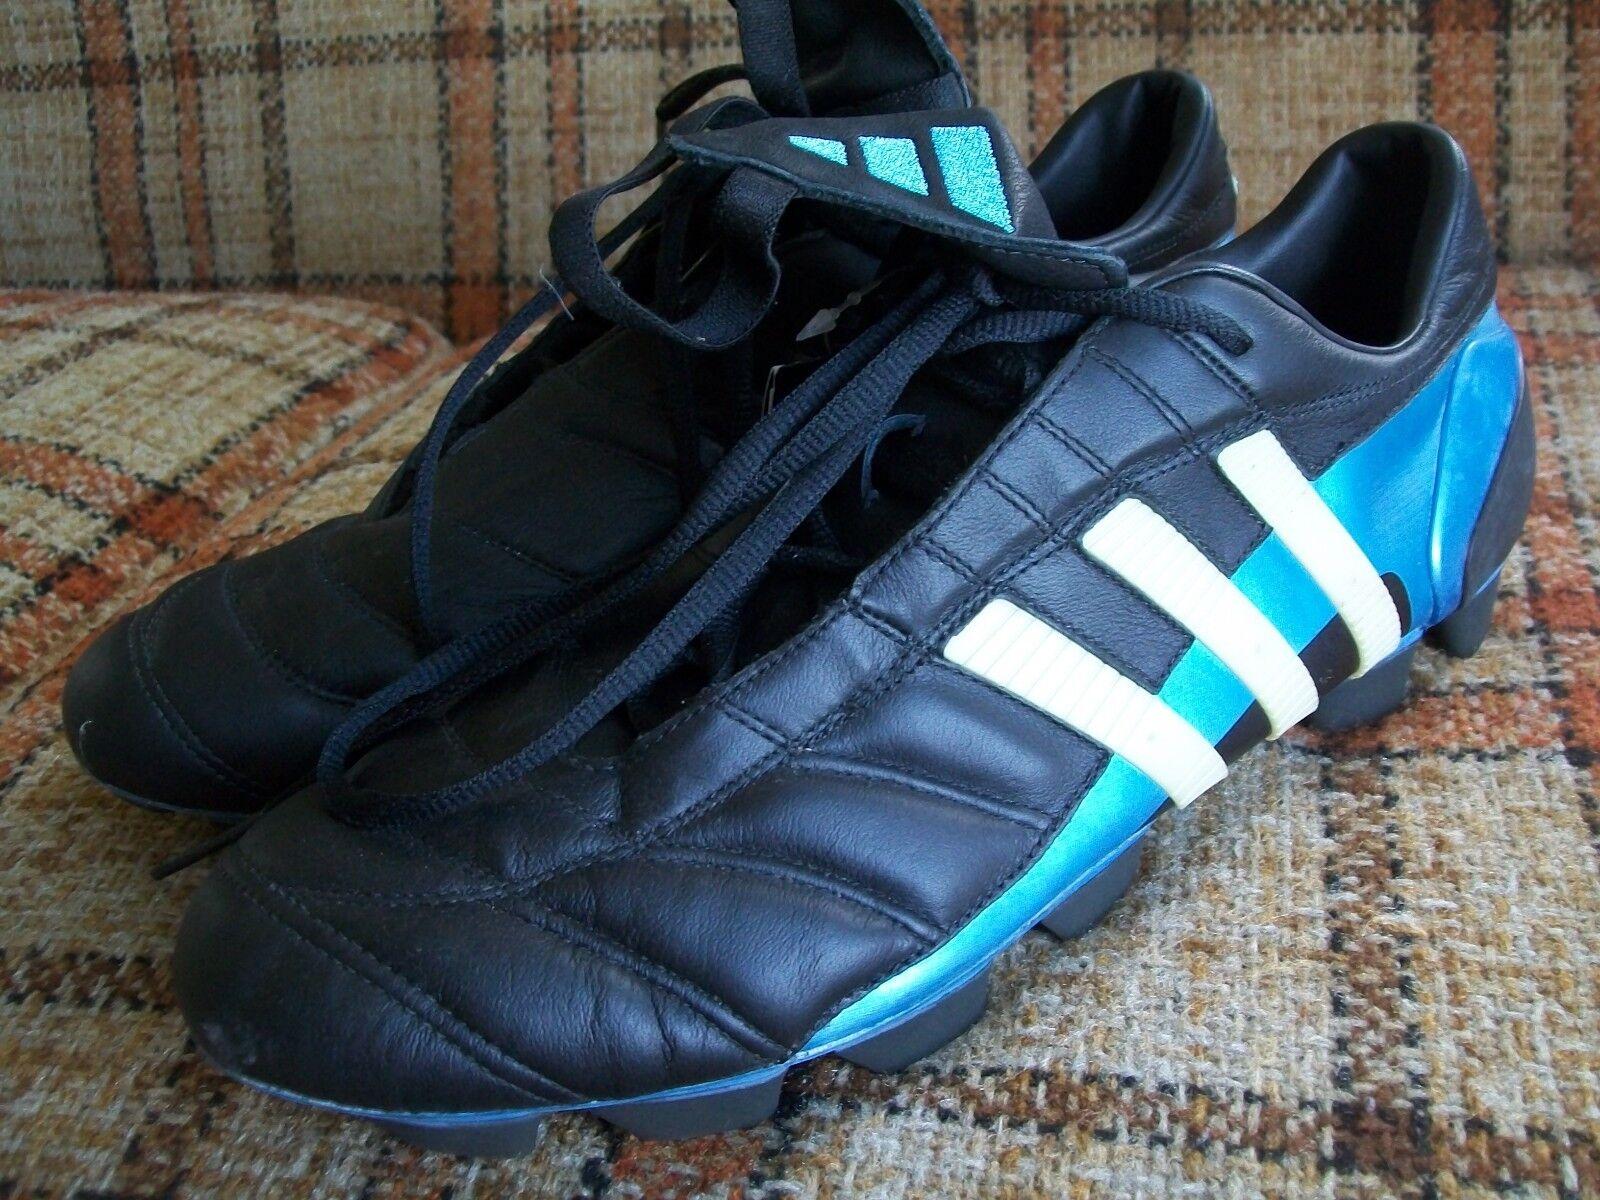 Adidas Mens Size 12 (FR 46 2 3) Black bluee Soccer Cleats 042264 -- NWT